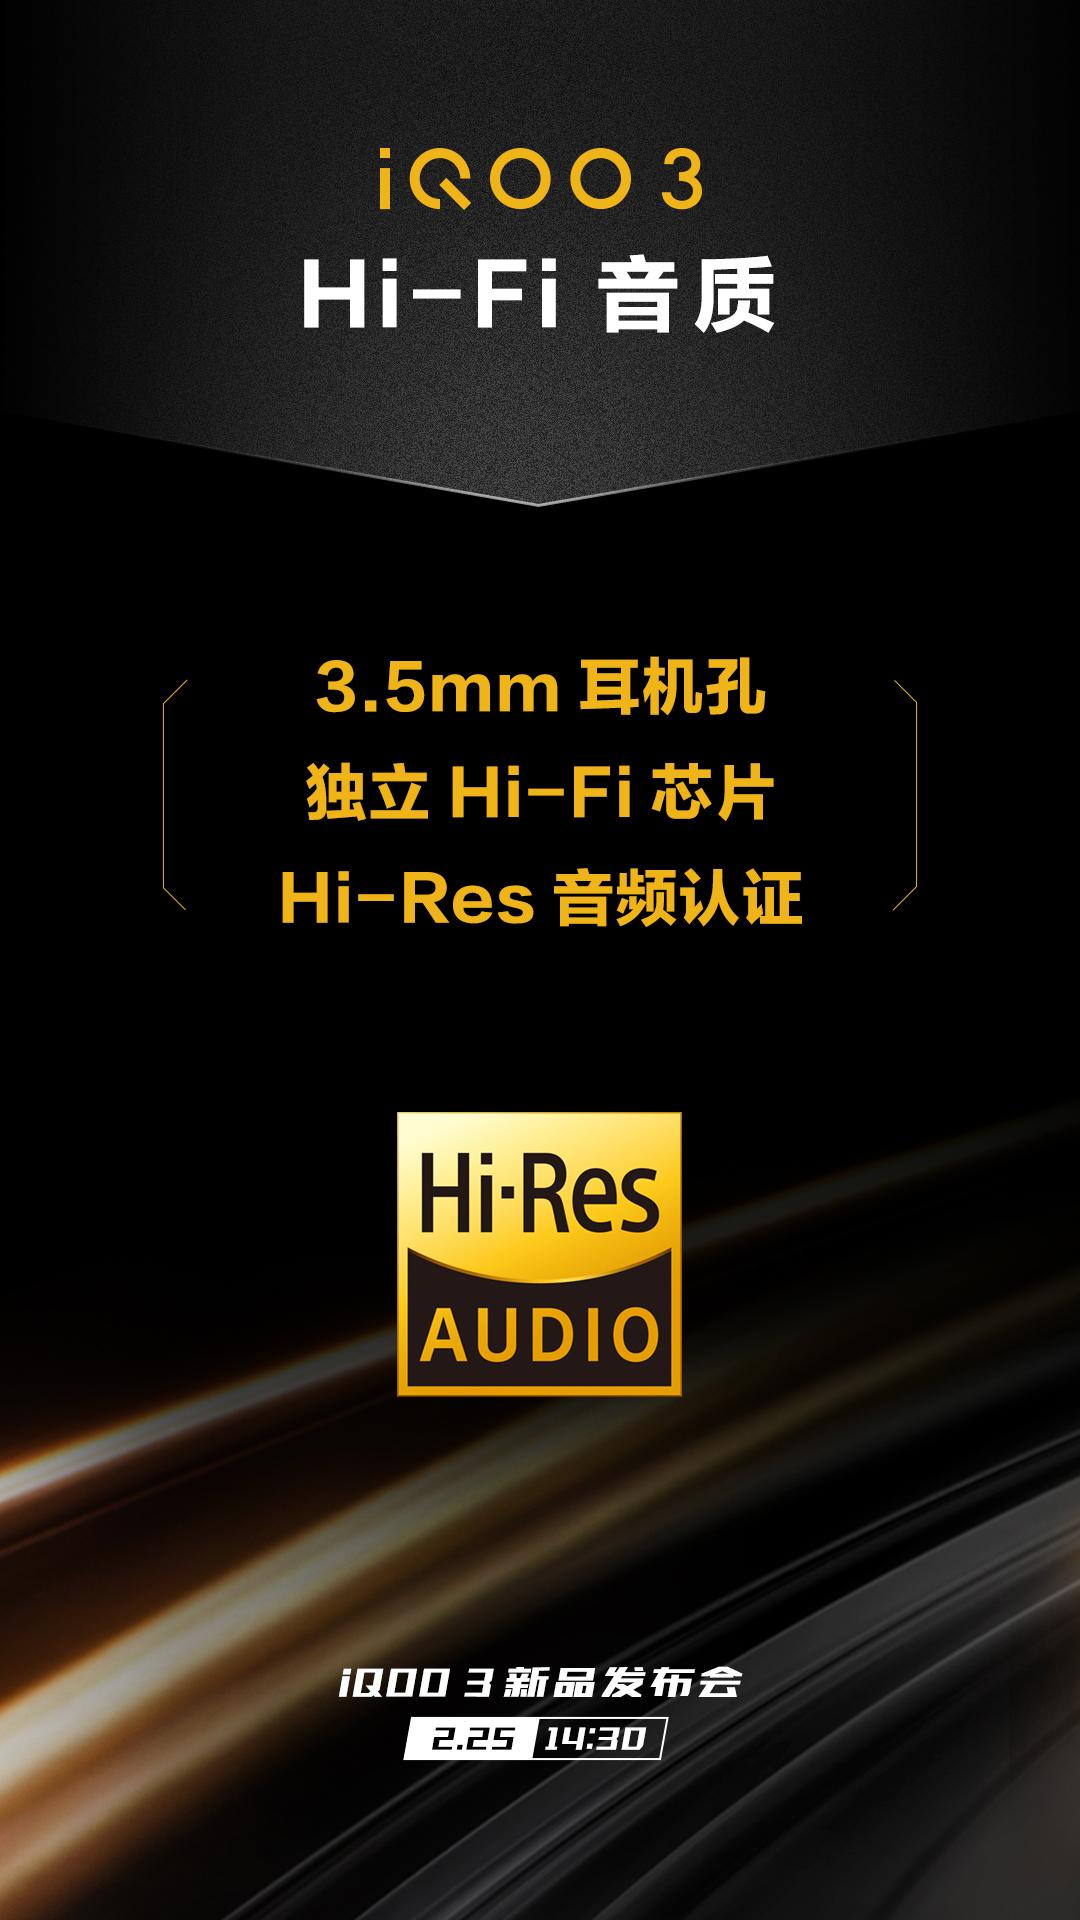 3.5mm耳机孔+独立解码芯片�羁招朽�喃自�Z道」 iQOO 3聆听Hi-Fi音质表现